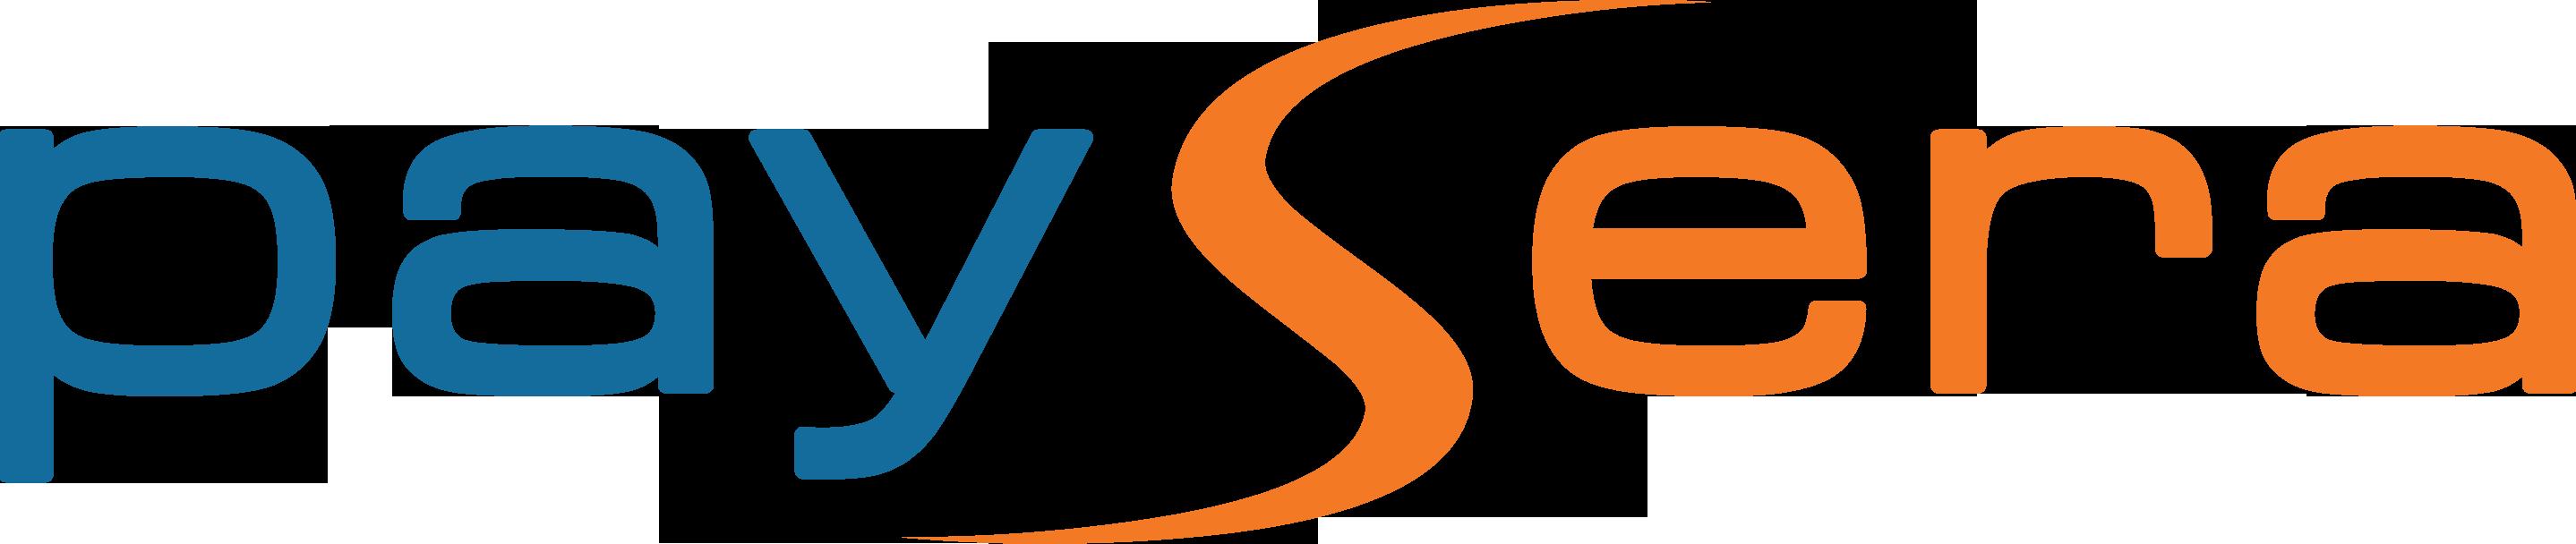 https://www.urmokaina.lt/img/cms/stipriausi%20lietuvoje/Paysera_logotype_internet.png